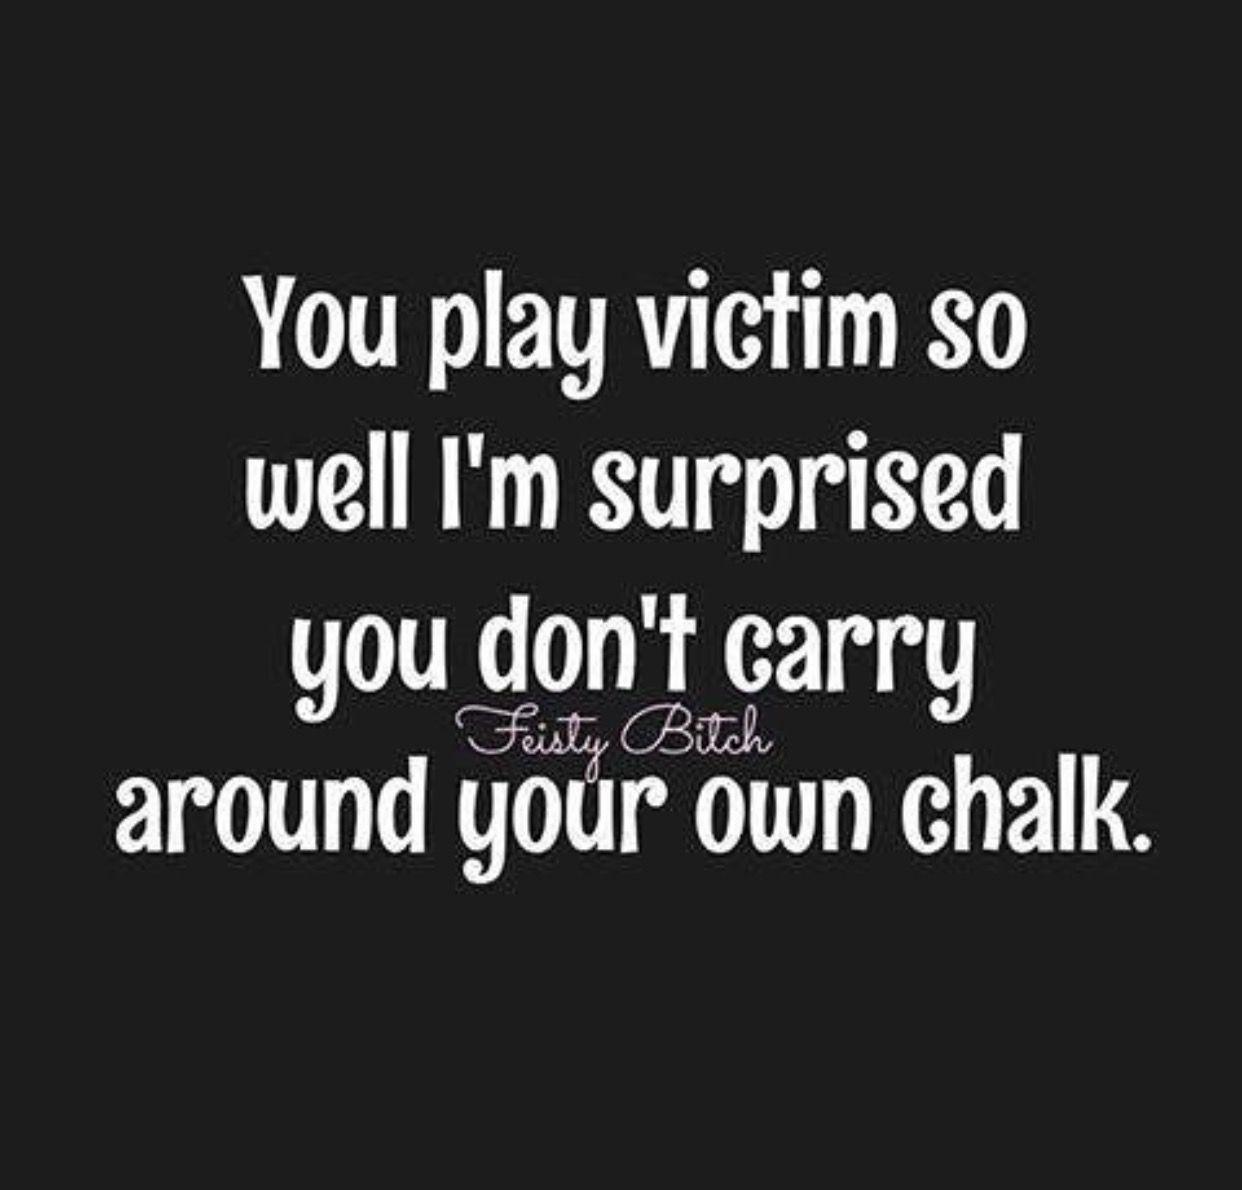 Victim Quotes Playing Victim  Ideas That Make Sense  Pinterest